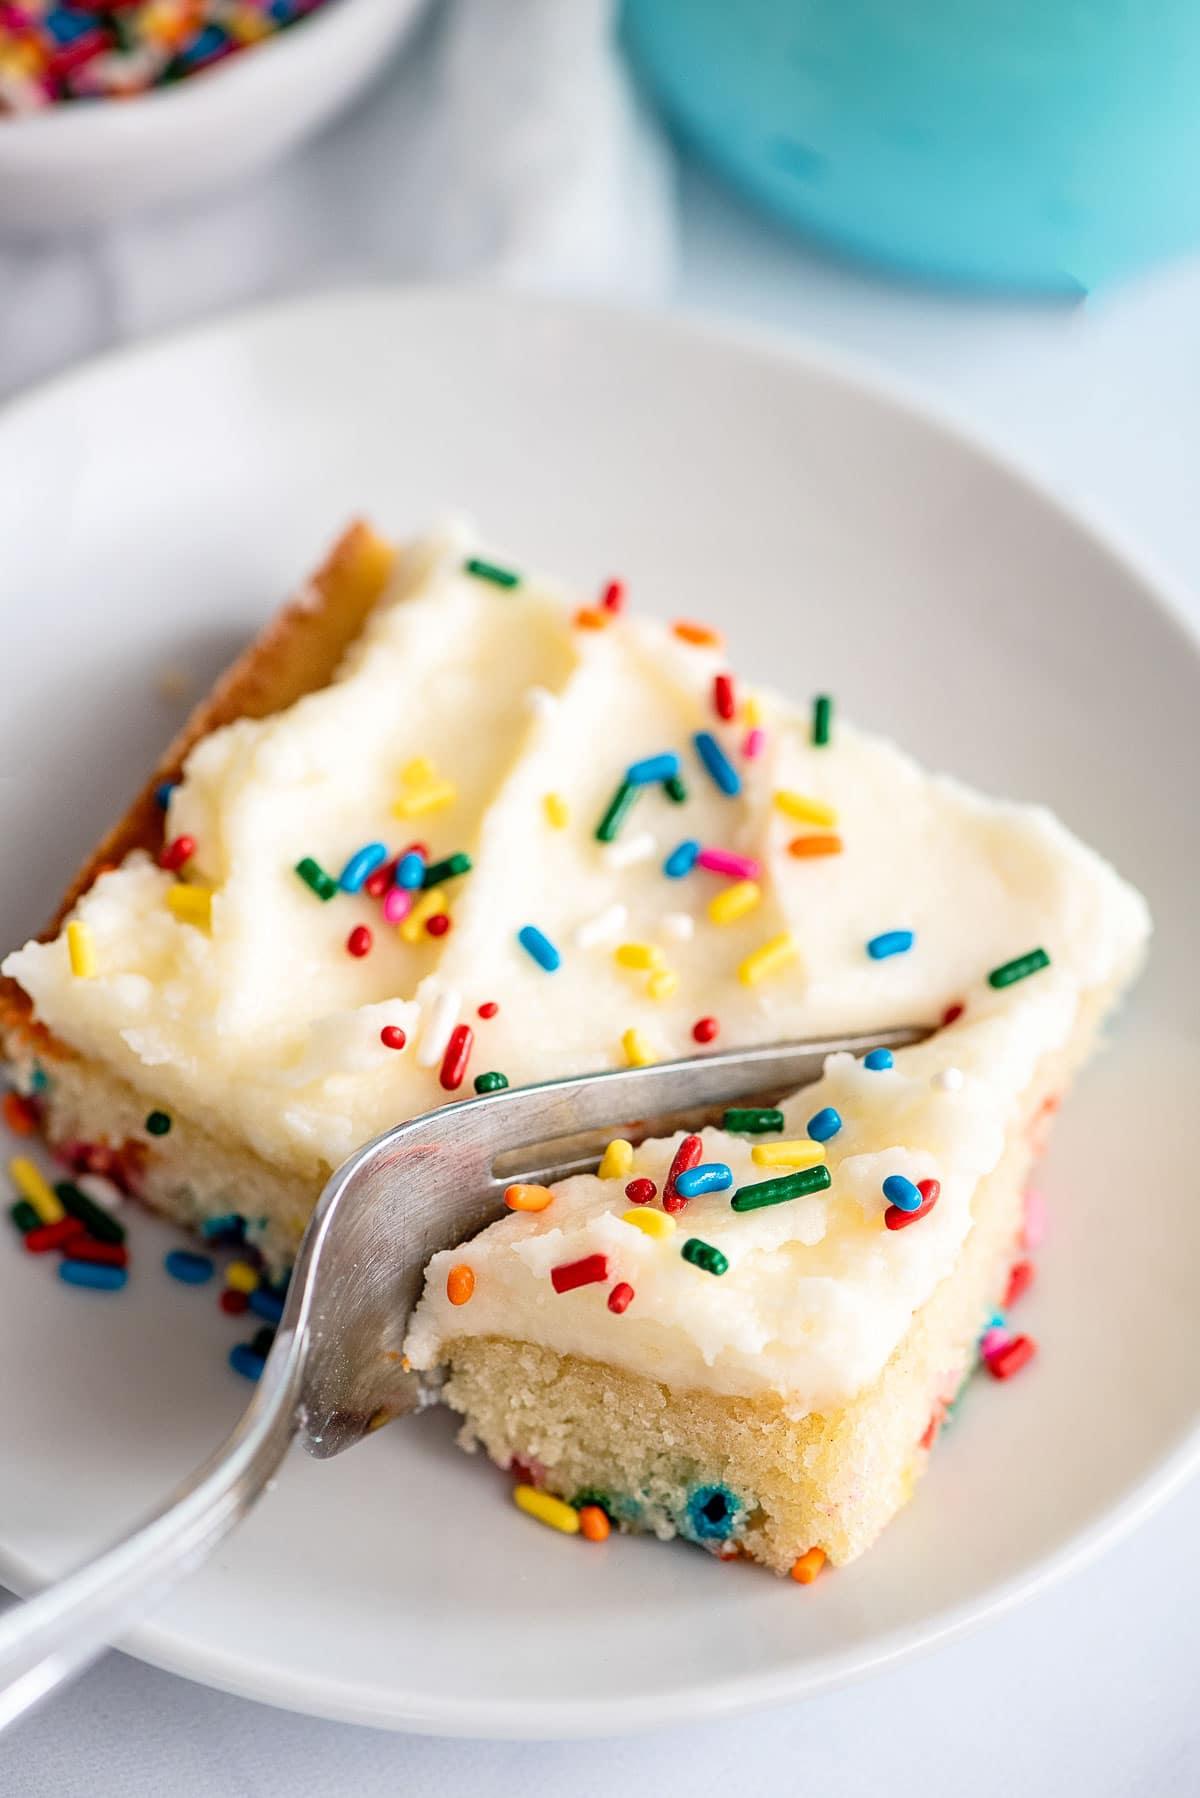 funfetti cake slice with fork